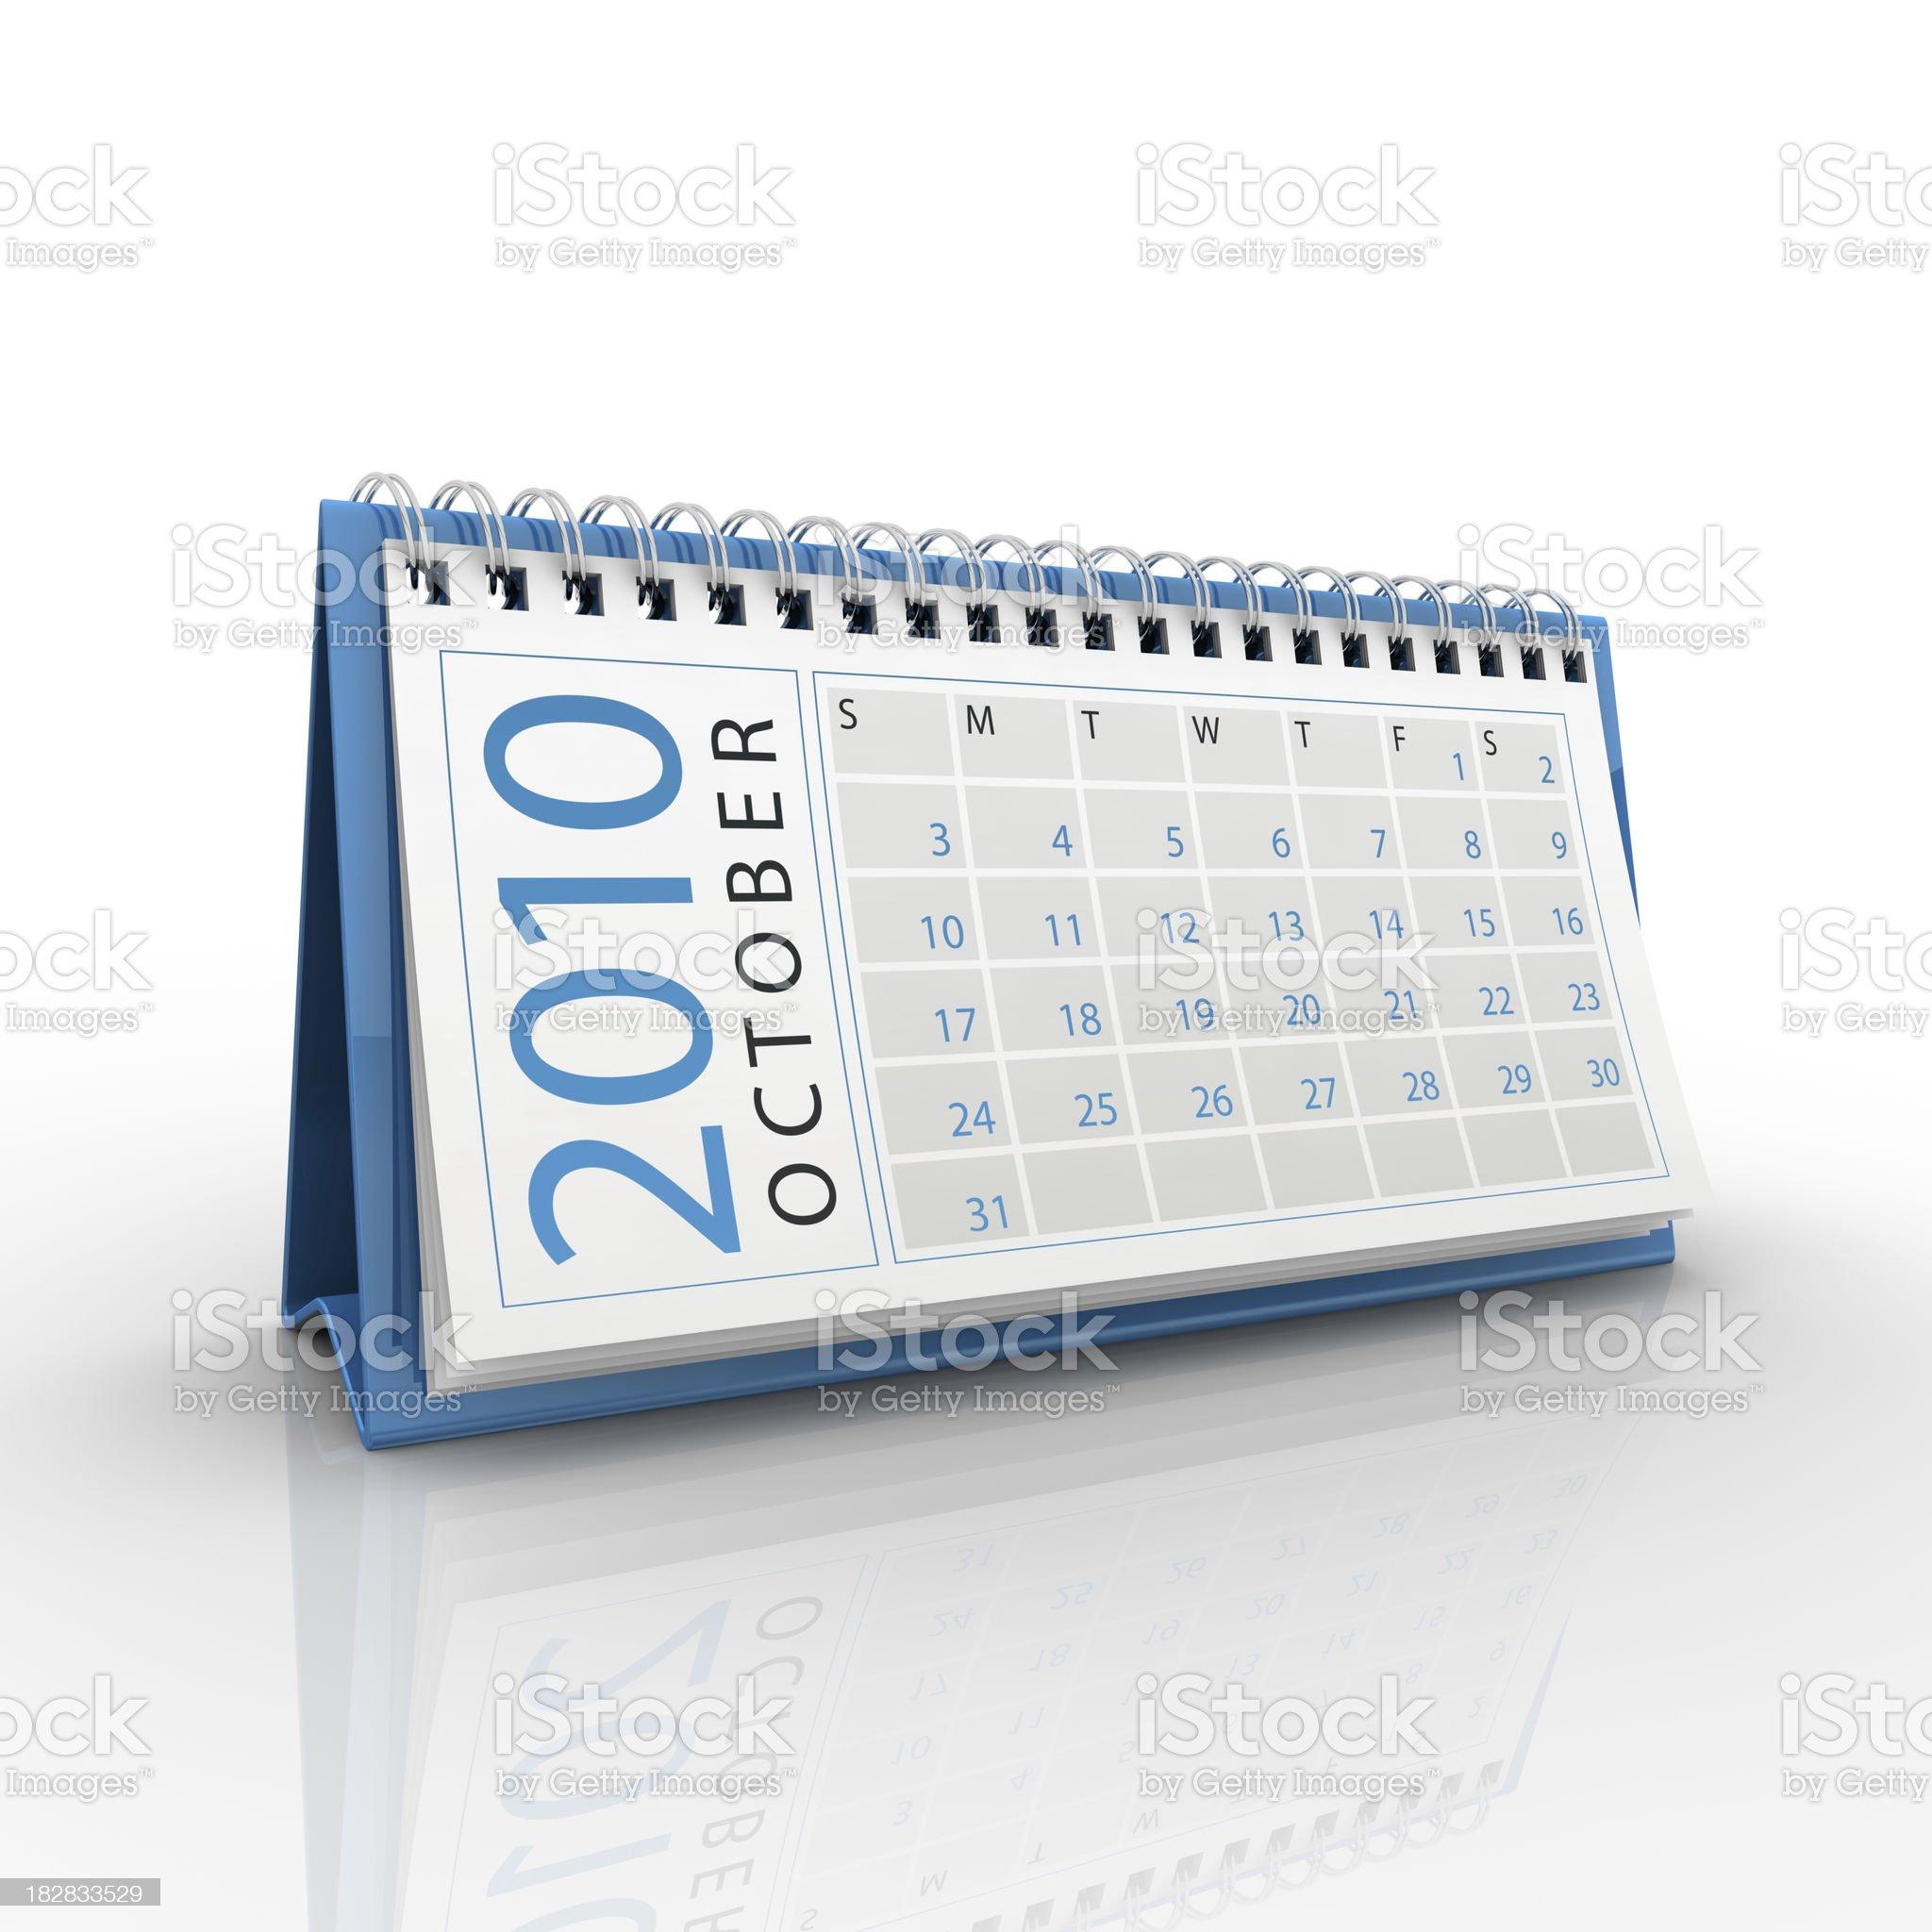 October 2010 calendar royalty-free stock photo